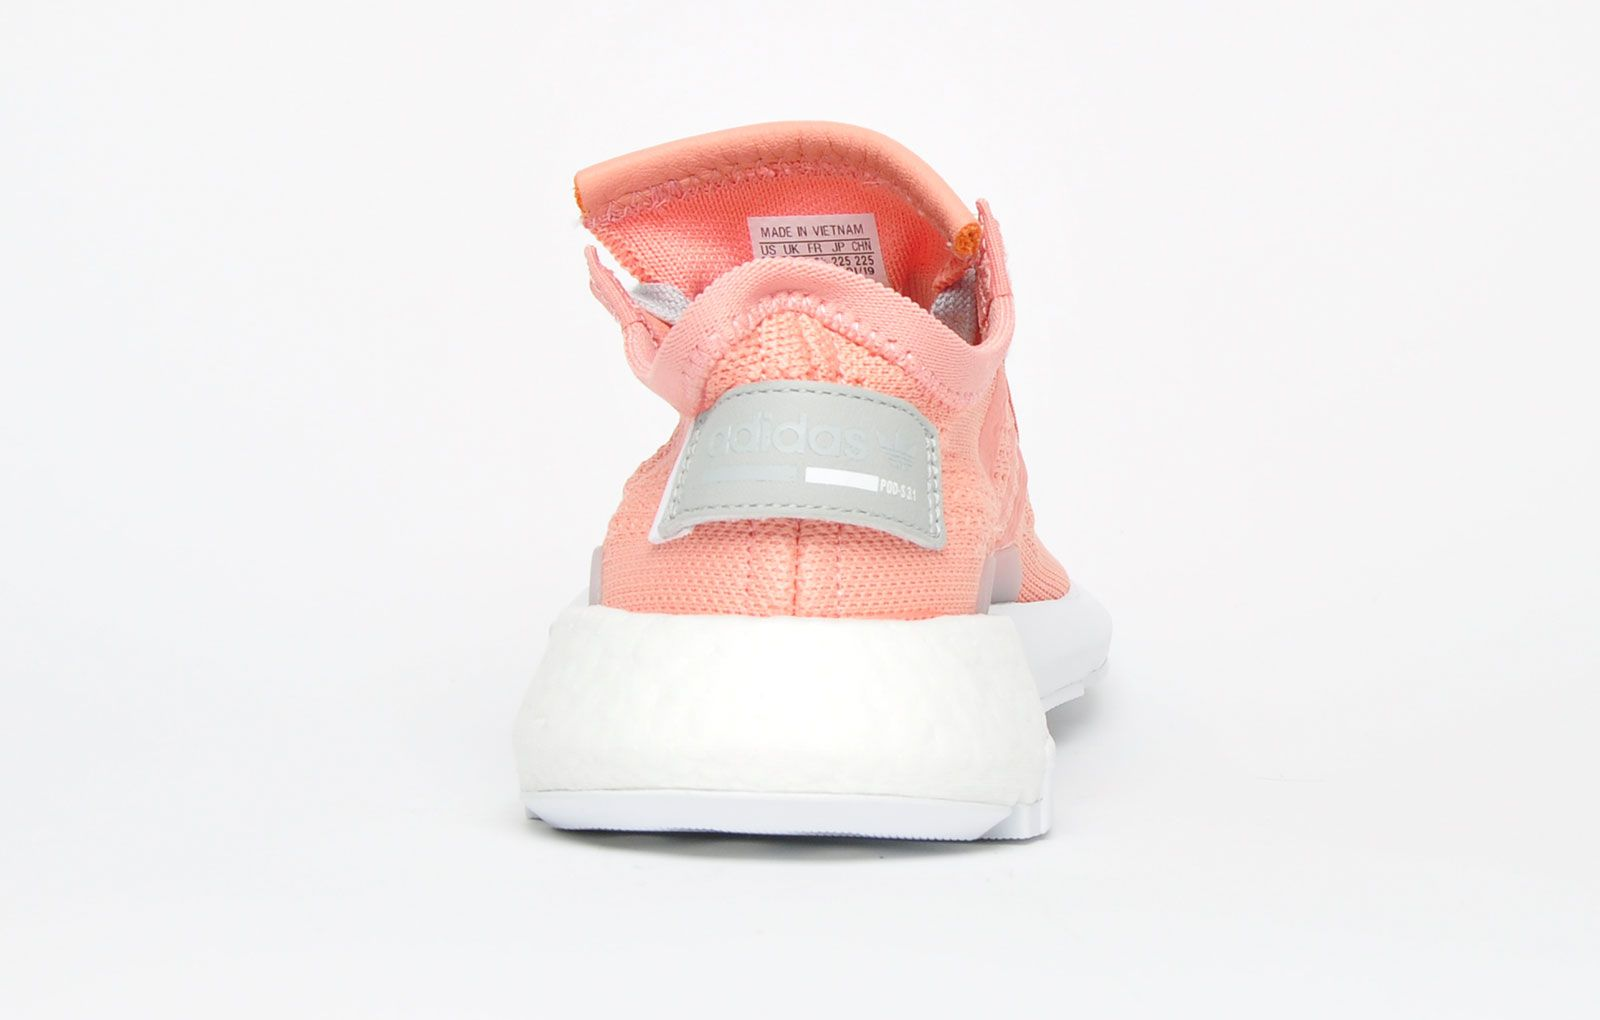 Adidas Originals POD-S3.1 Boost Womens Girls